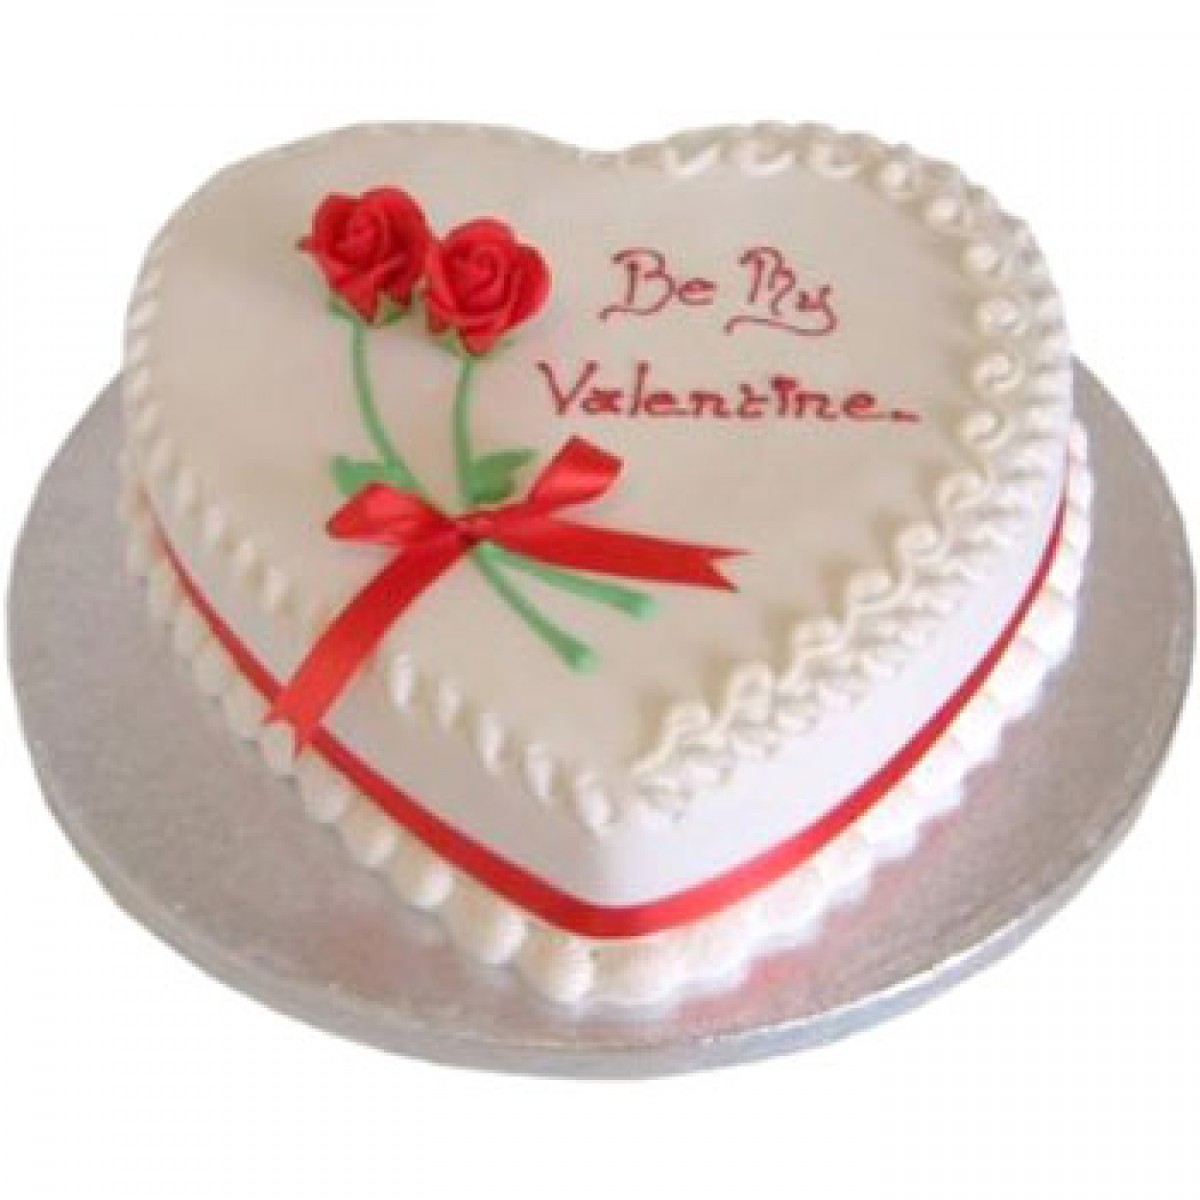 La Rosa Bakery Strawberry Cake